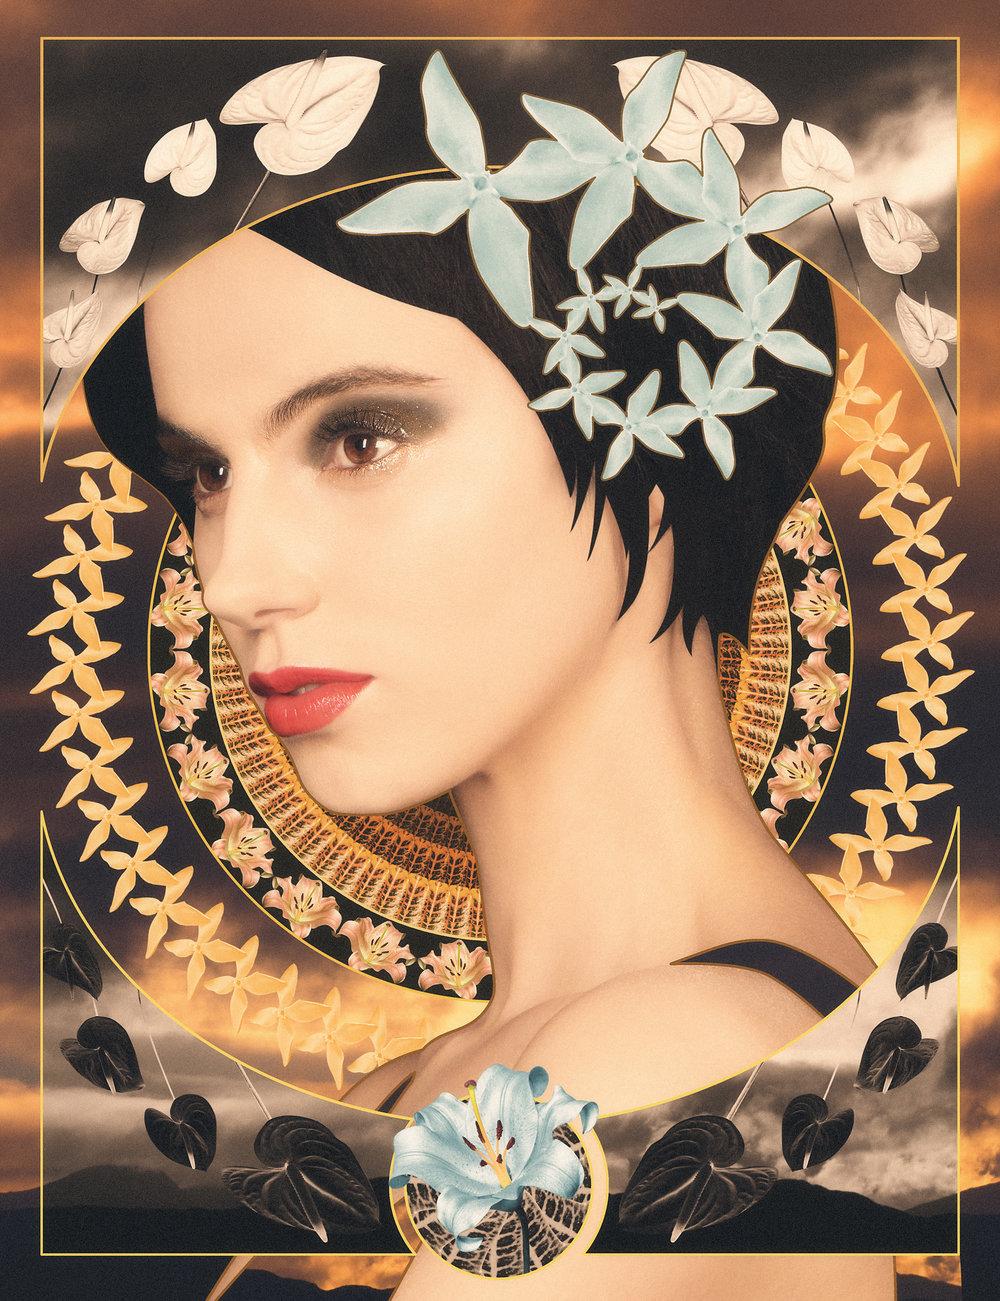 Chanel / George McLeod / Luxure Magazine